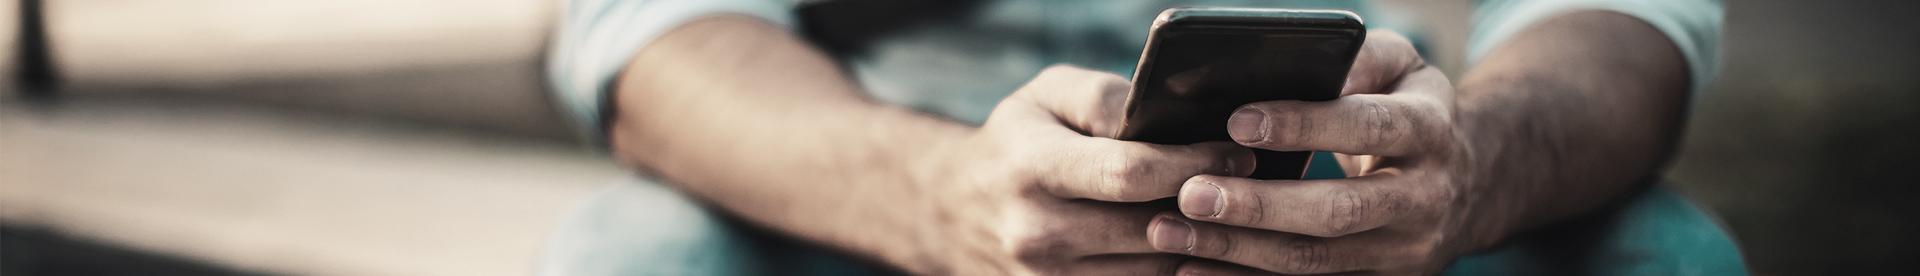 Kontakt z biórem krystian ziółka